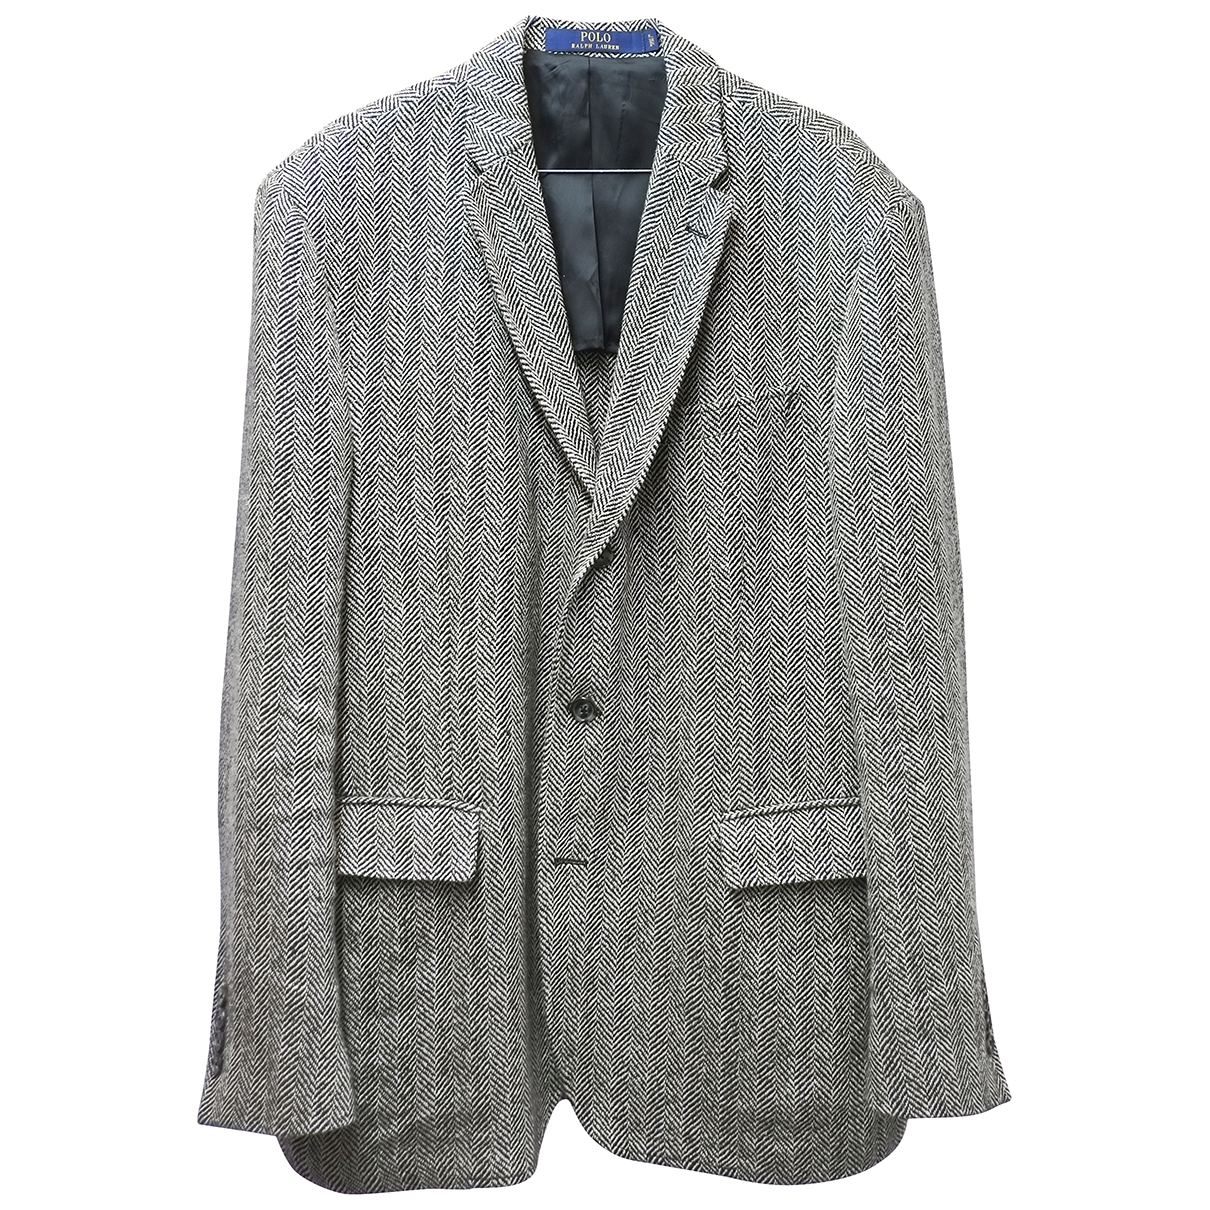 Polo Ralph Lauren \N Grey Wool jacket  for Men L International